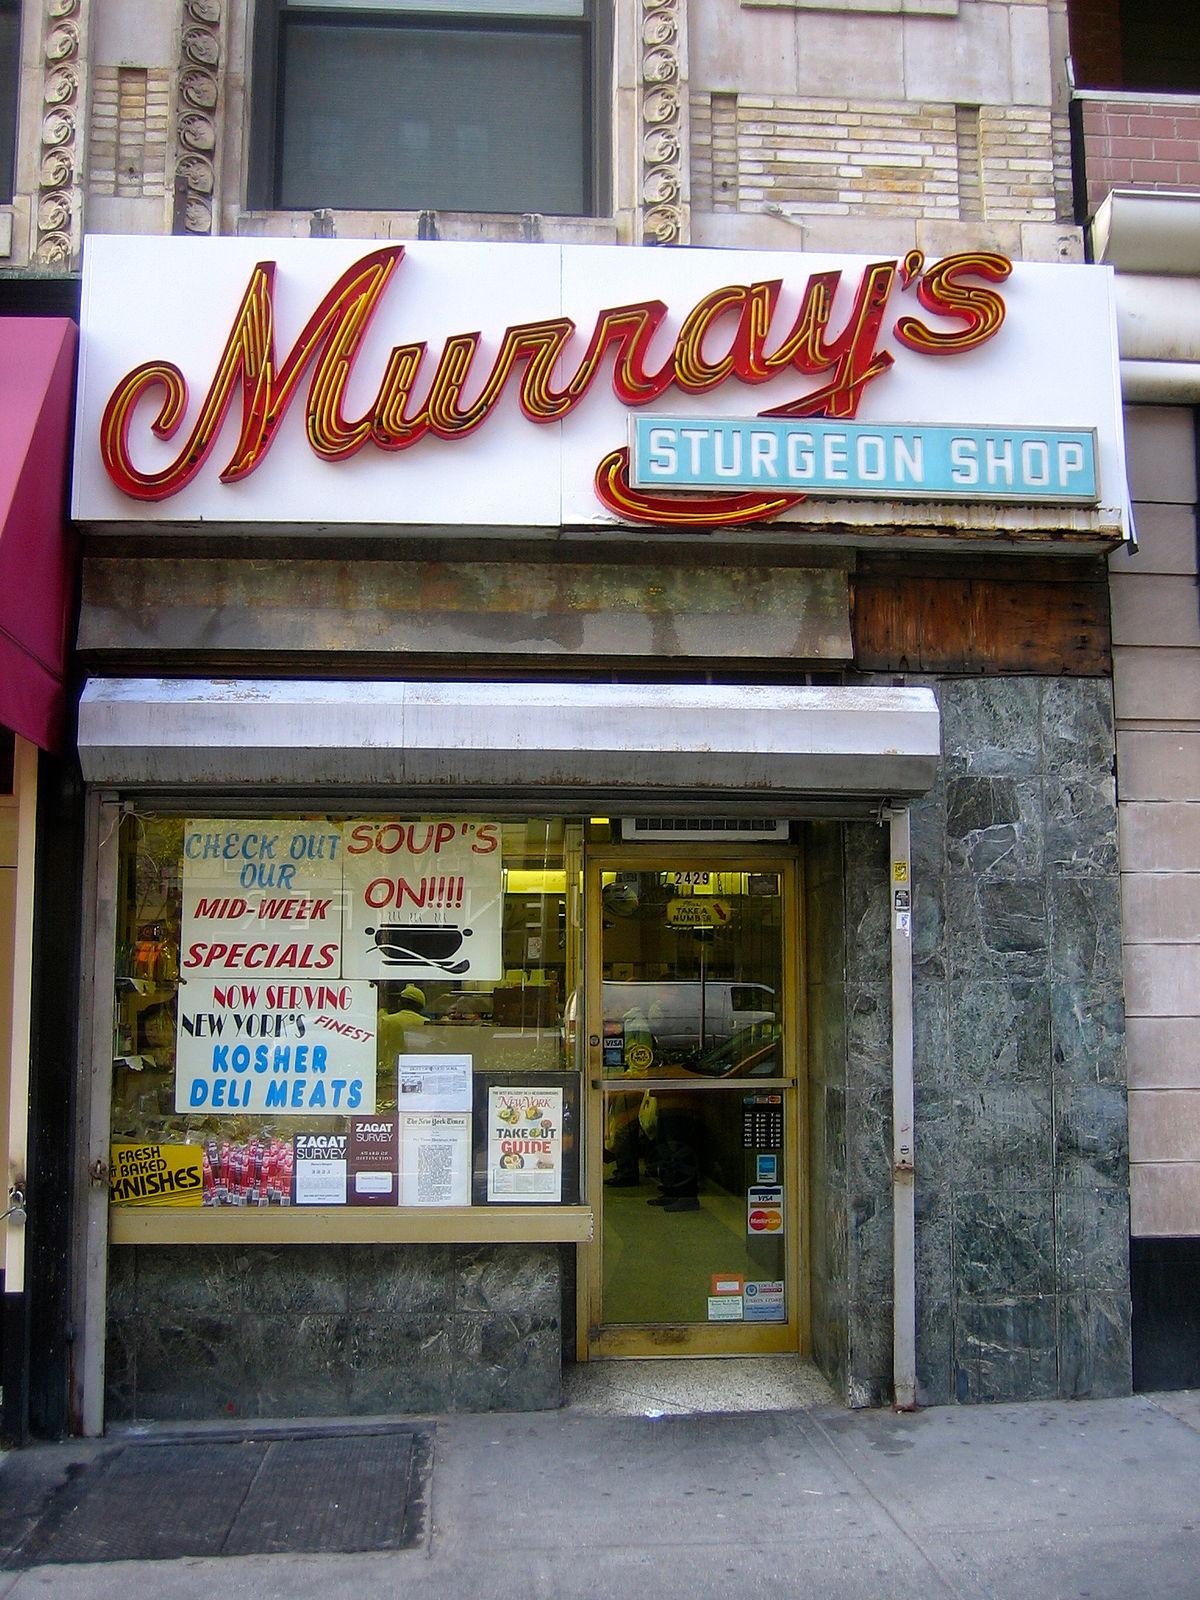 Murray's Sturgeon Shop - Wikipedia